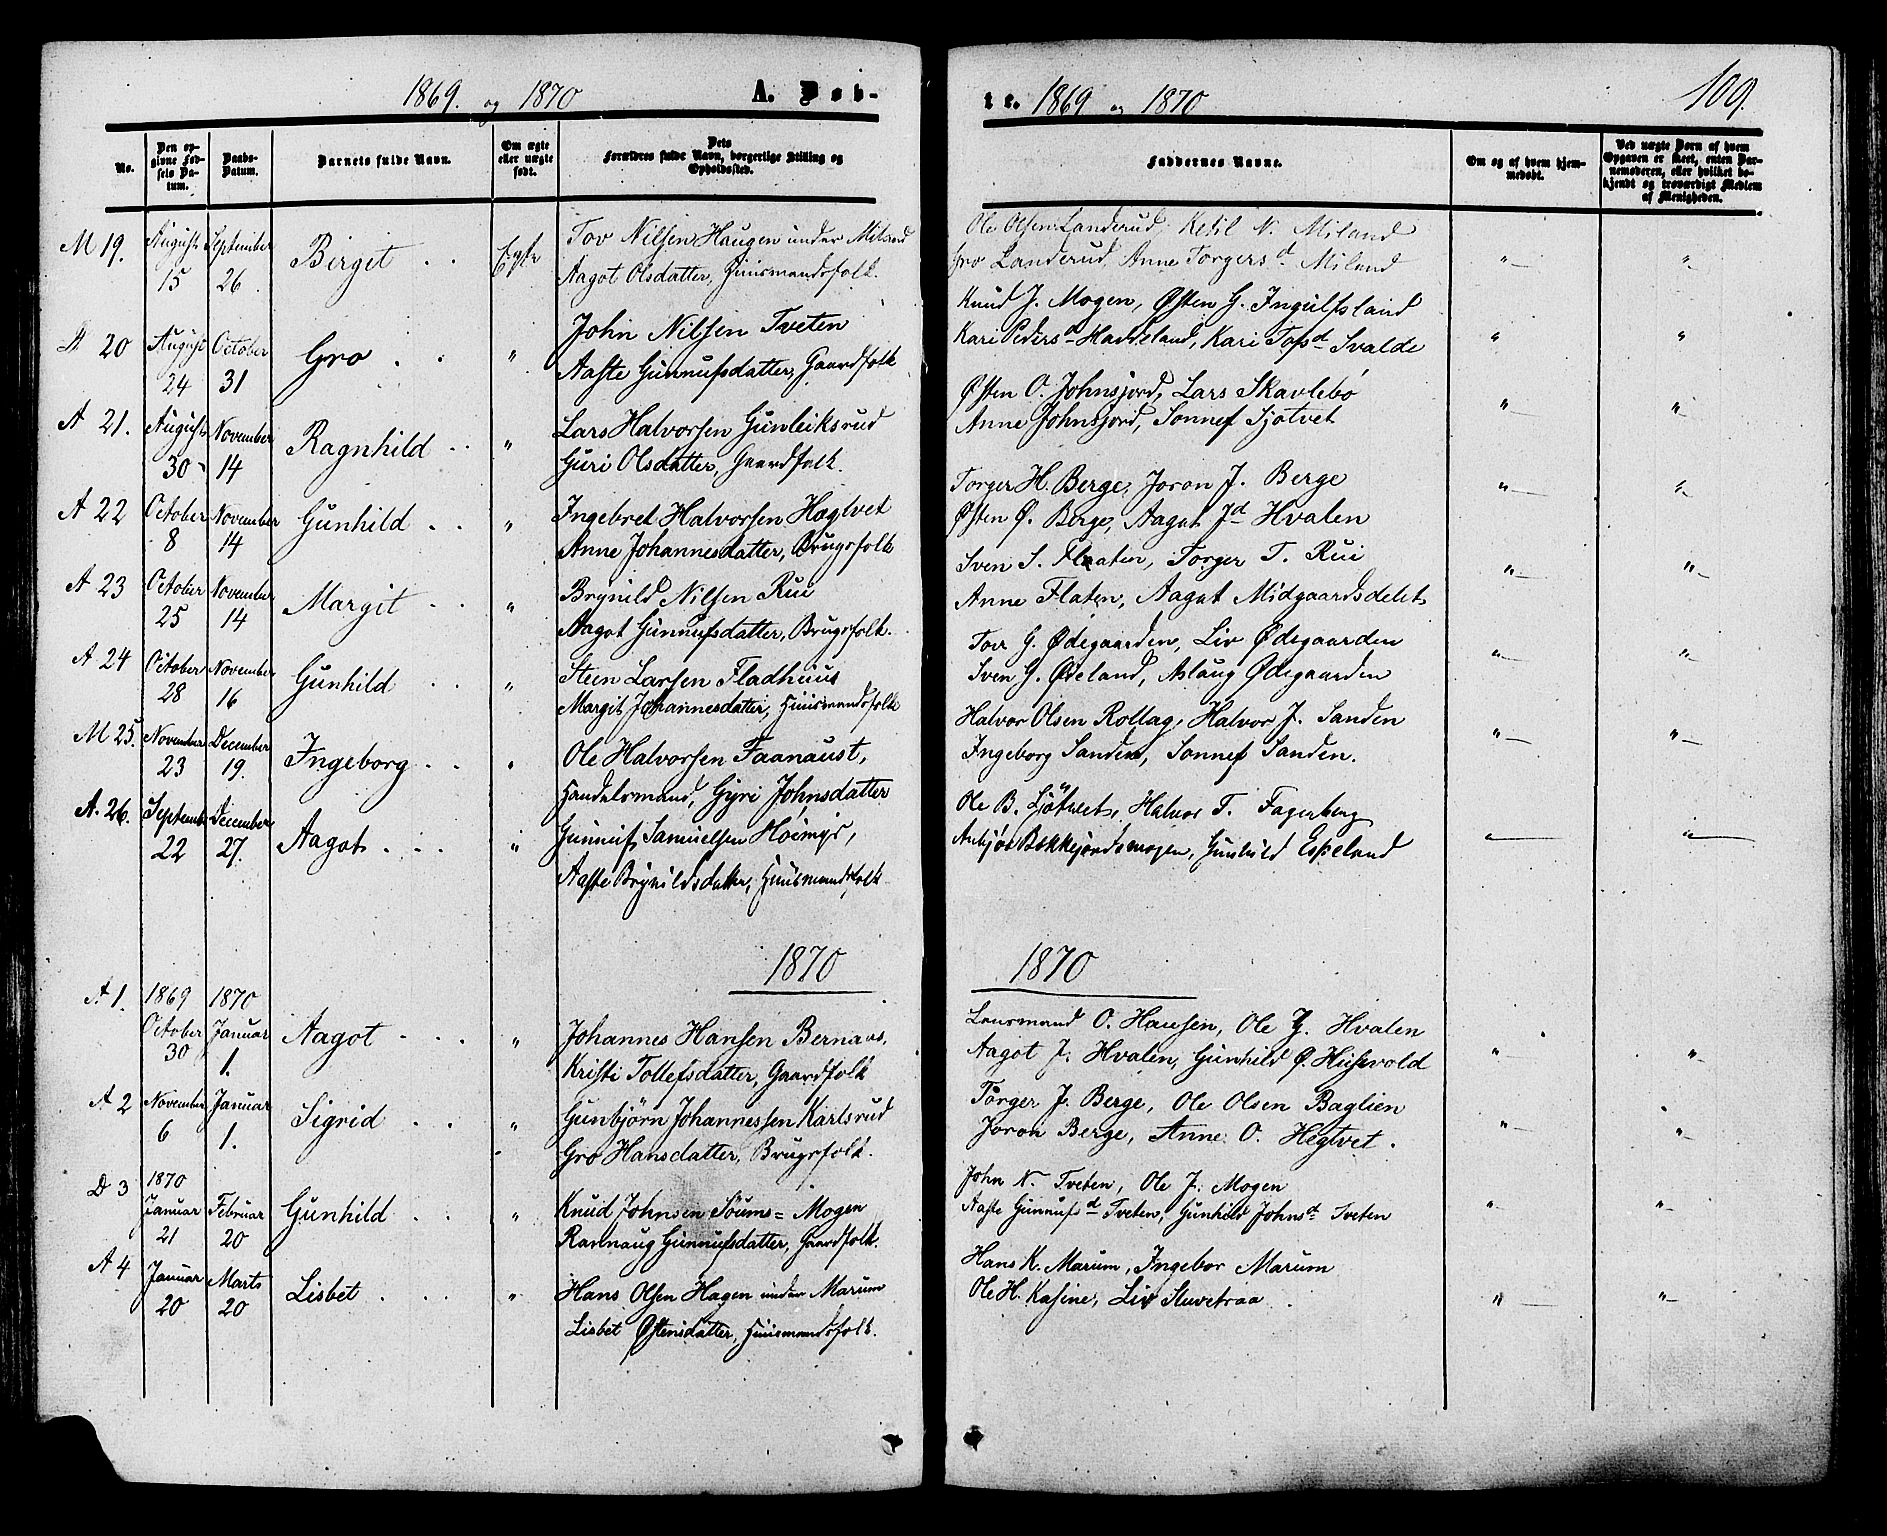 SAKO, Tinn kirkebøker, F/Fa/L0006: Ministerialbok nr. I 6, 1857-1878, s. 109